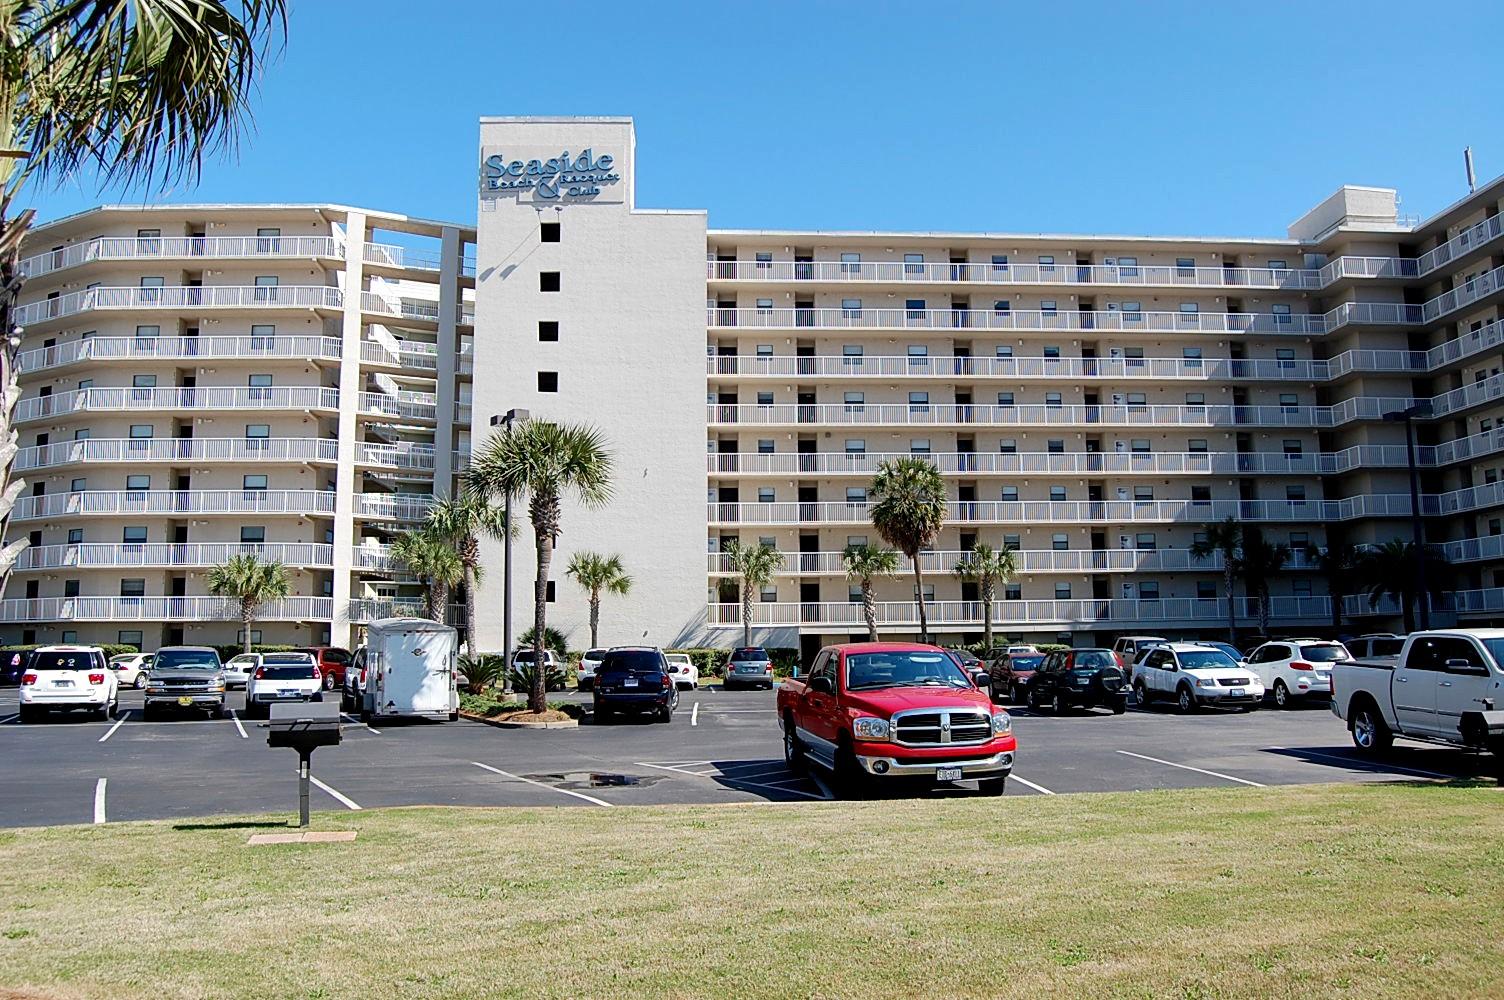 Seaside Beach & Racquet 5415 Condo rental in Seaside Beach and Racquet Club in Orange Beach Alabama - #2